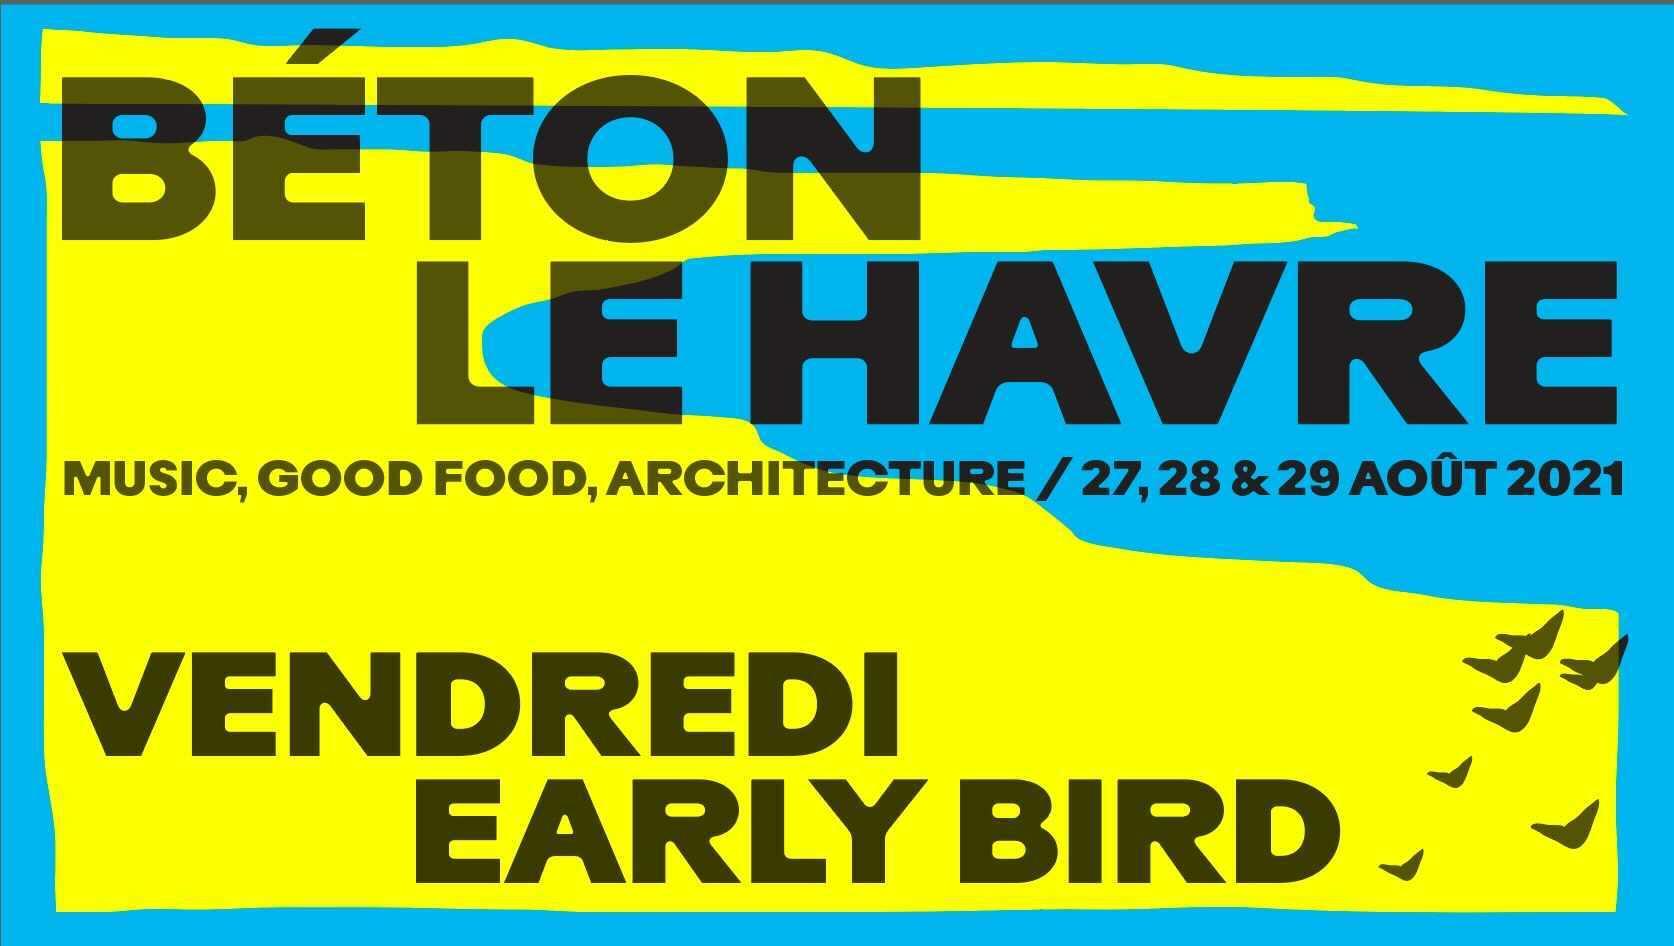 BÉTON FESTIVAL - VENDREDI EARLY BIRD